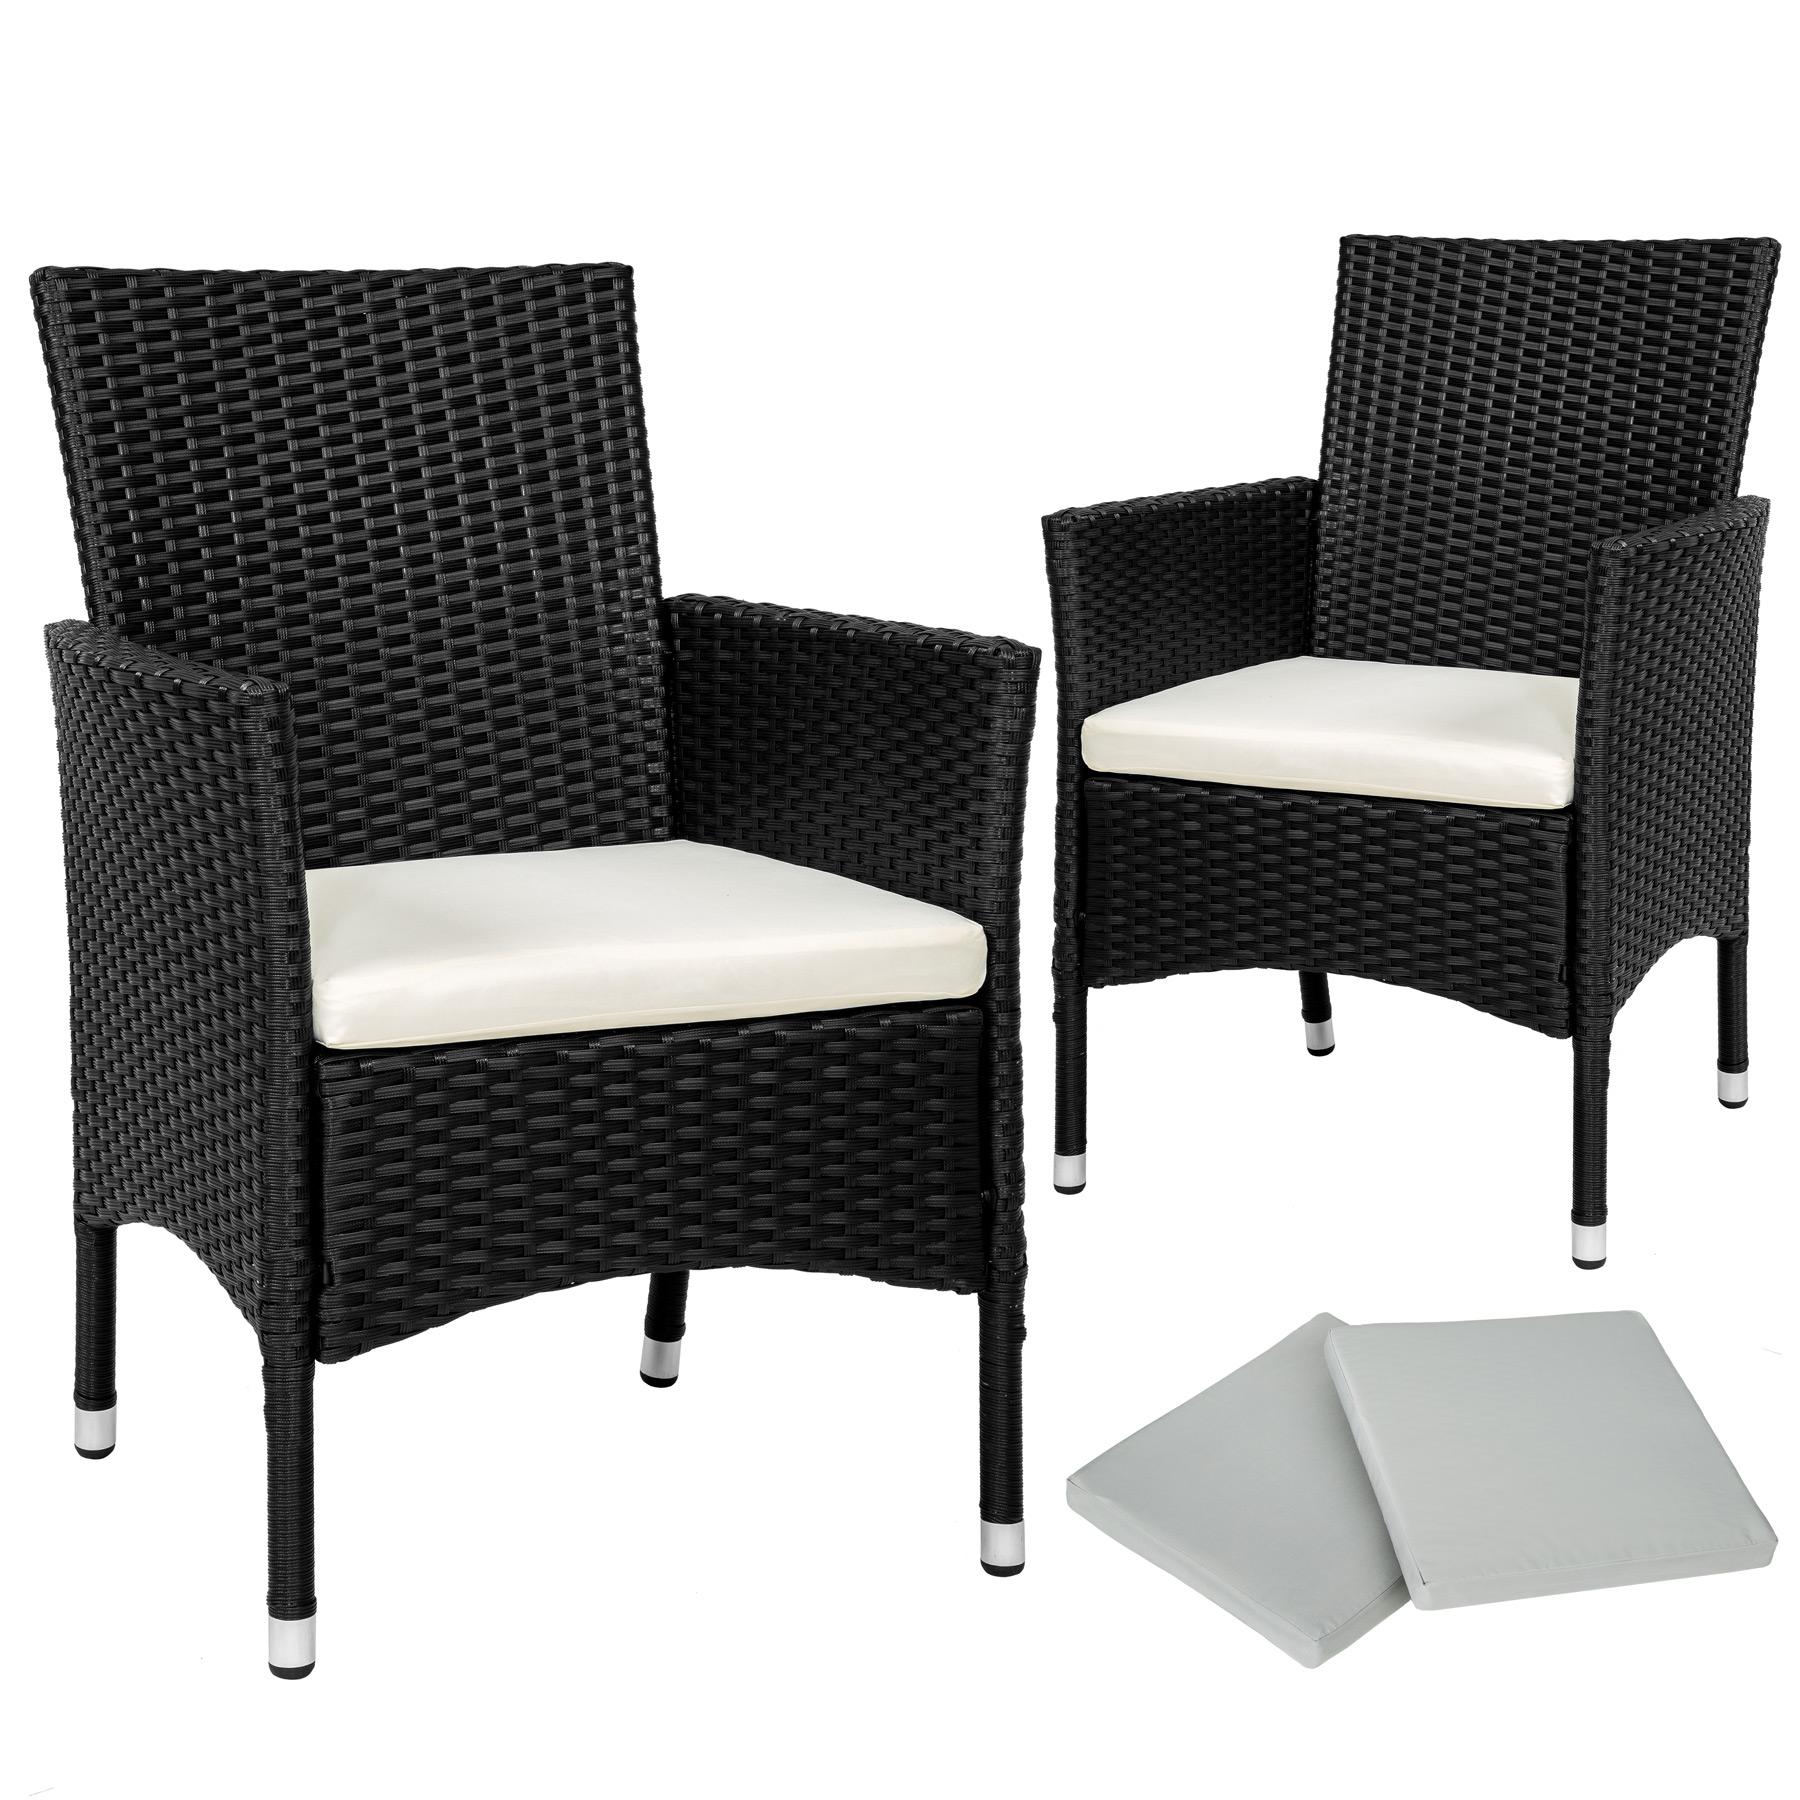 Genial 2er Set Poly Rattan Gartenstuhl Stuhl Sessel Hochlehner Kissen +2 Bezüge  Schwarz | EBay